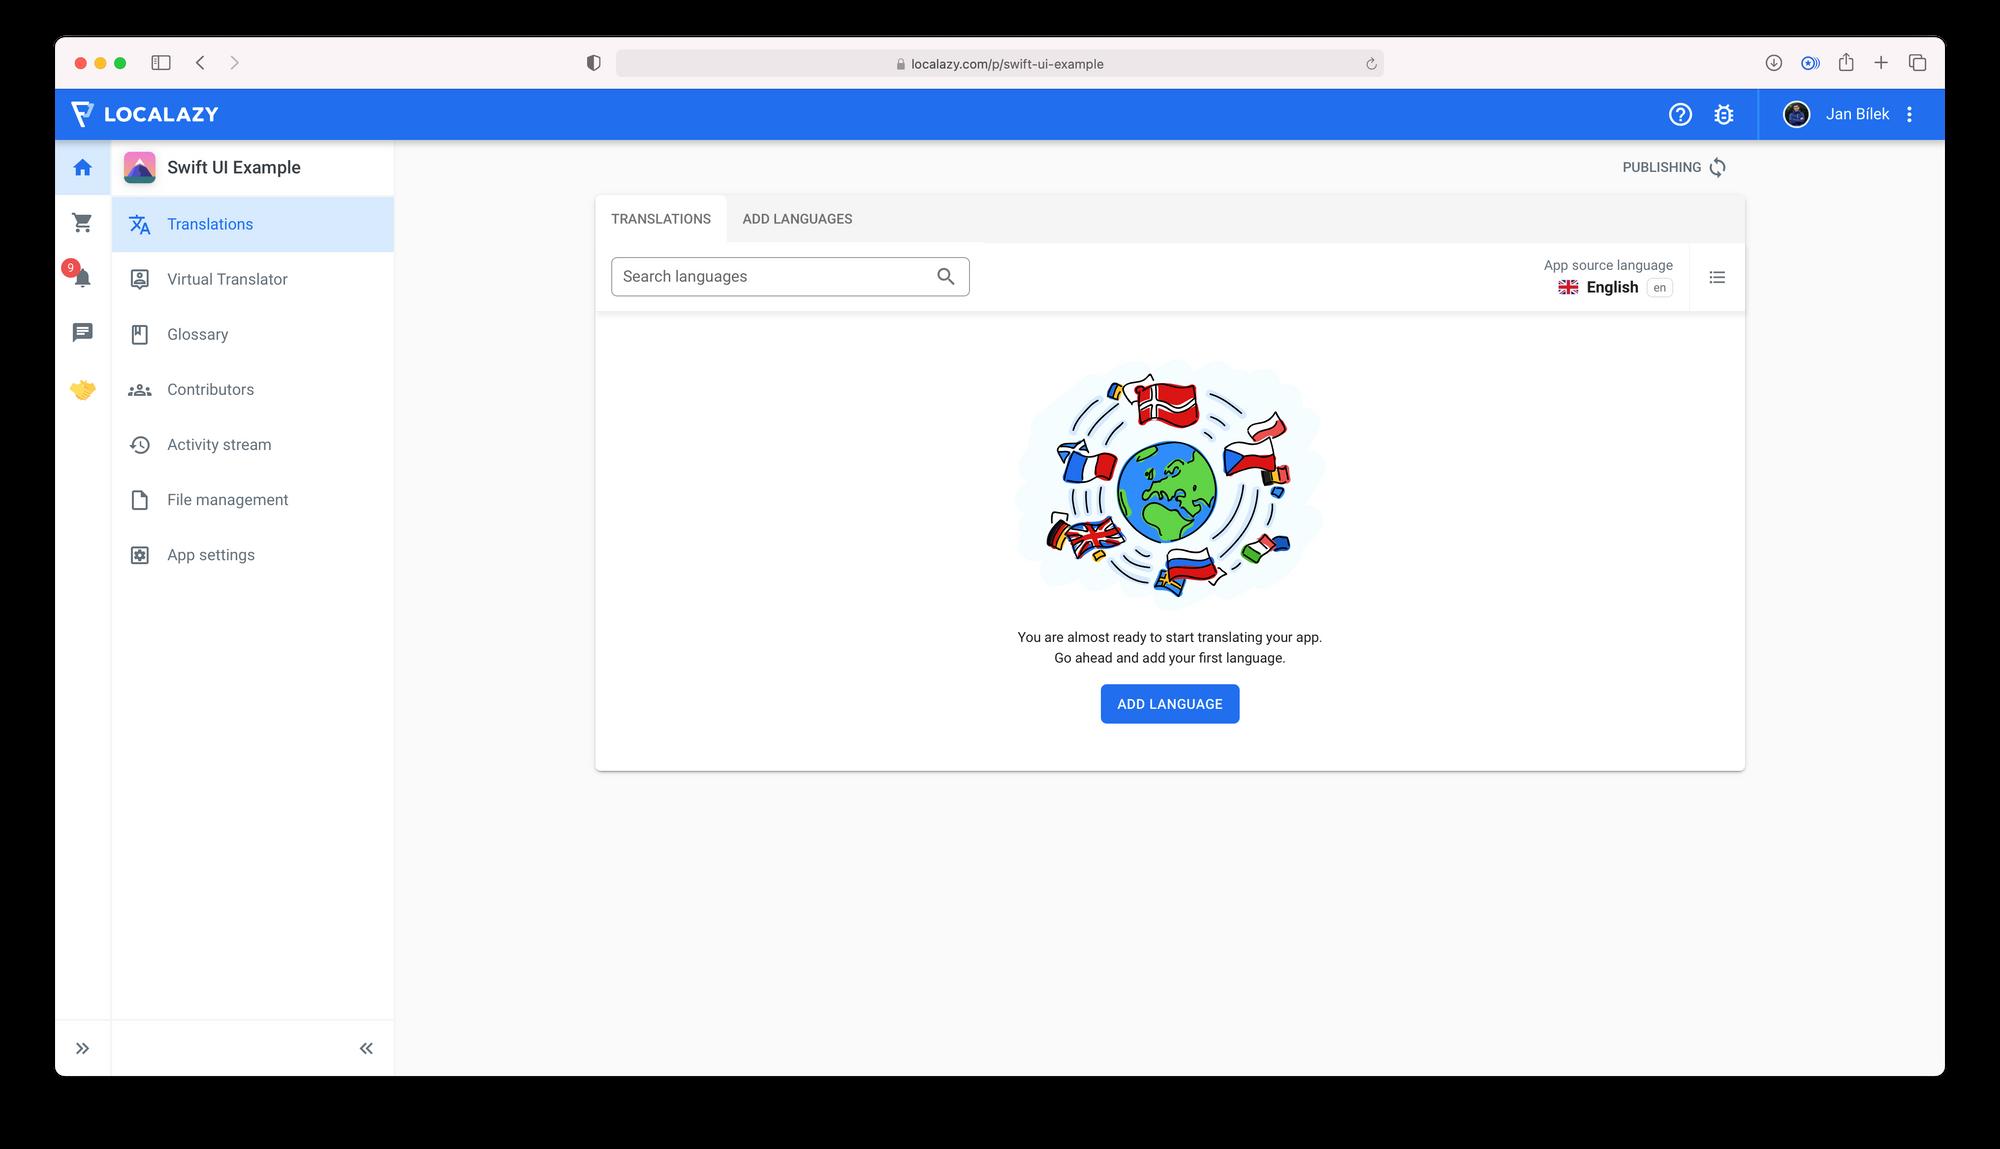 Localazy UI after uploading source language